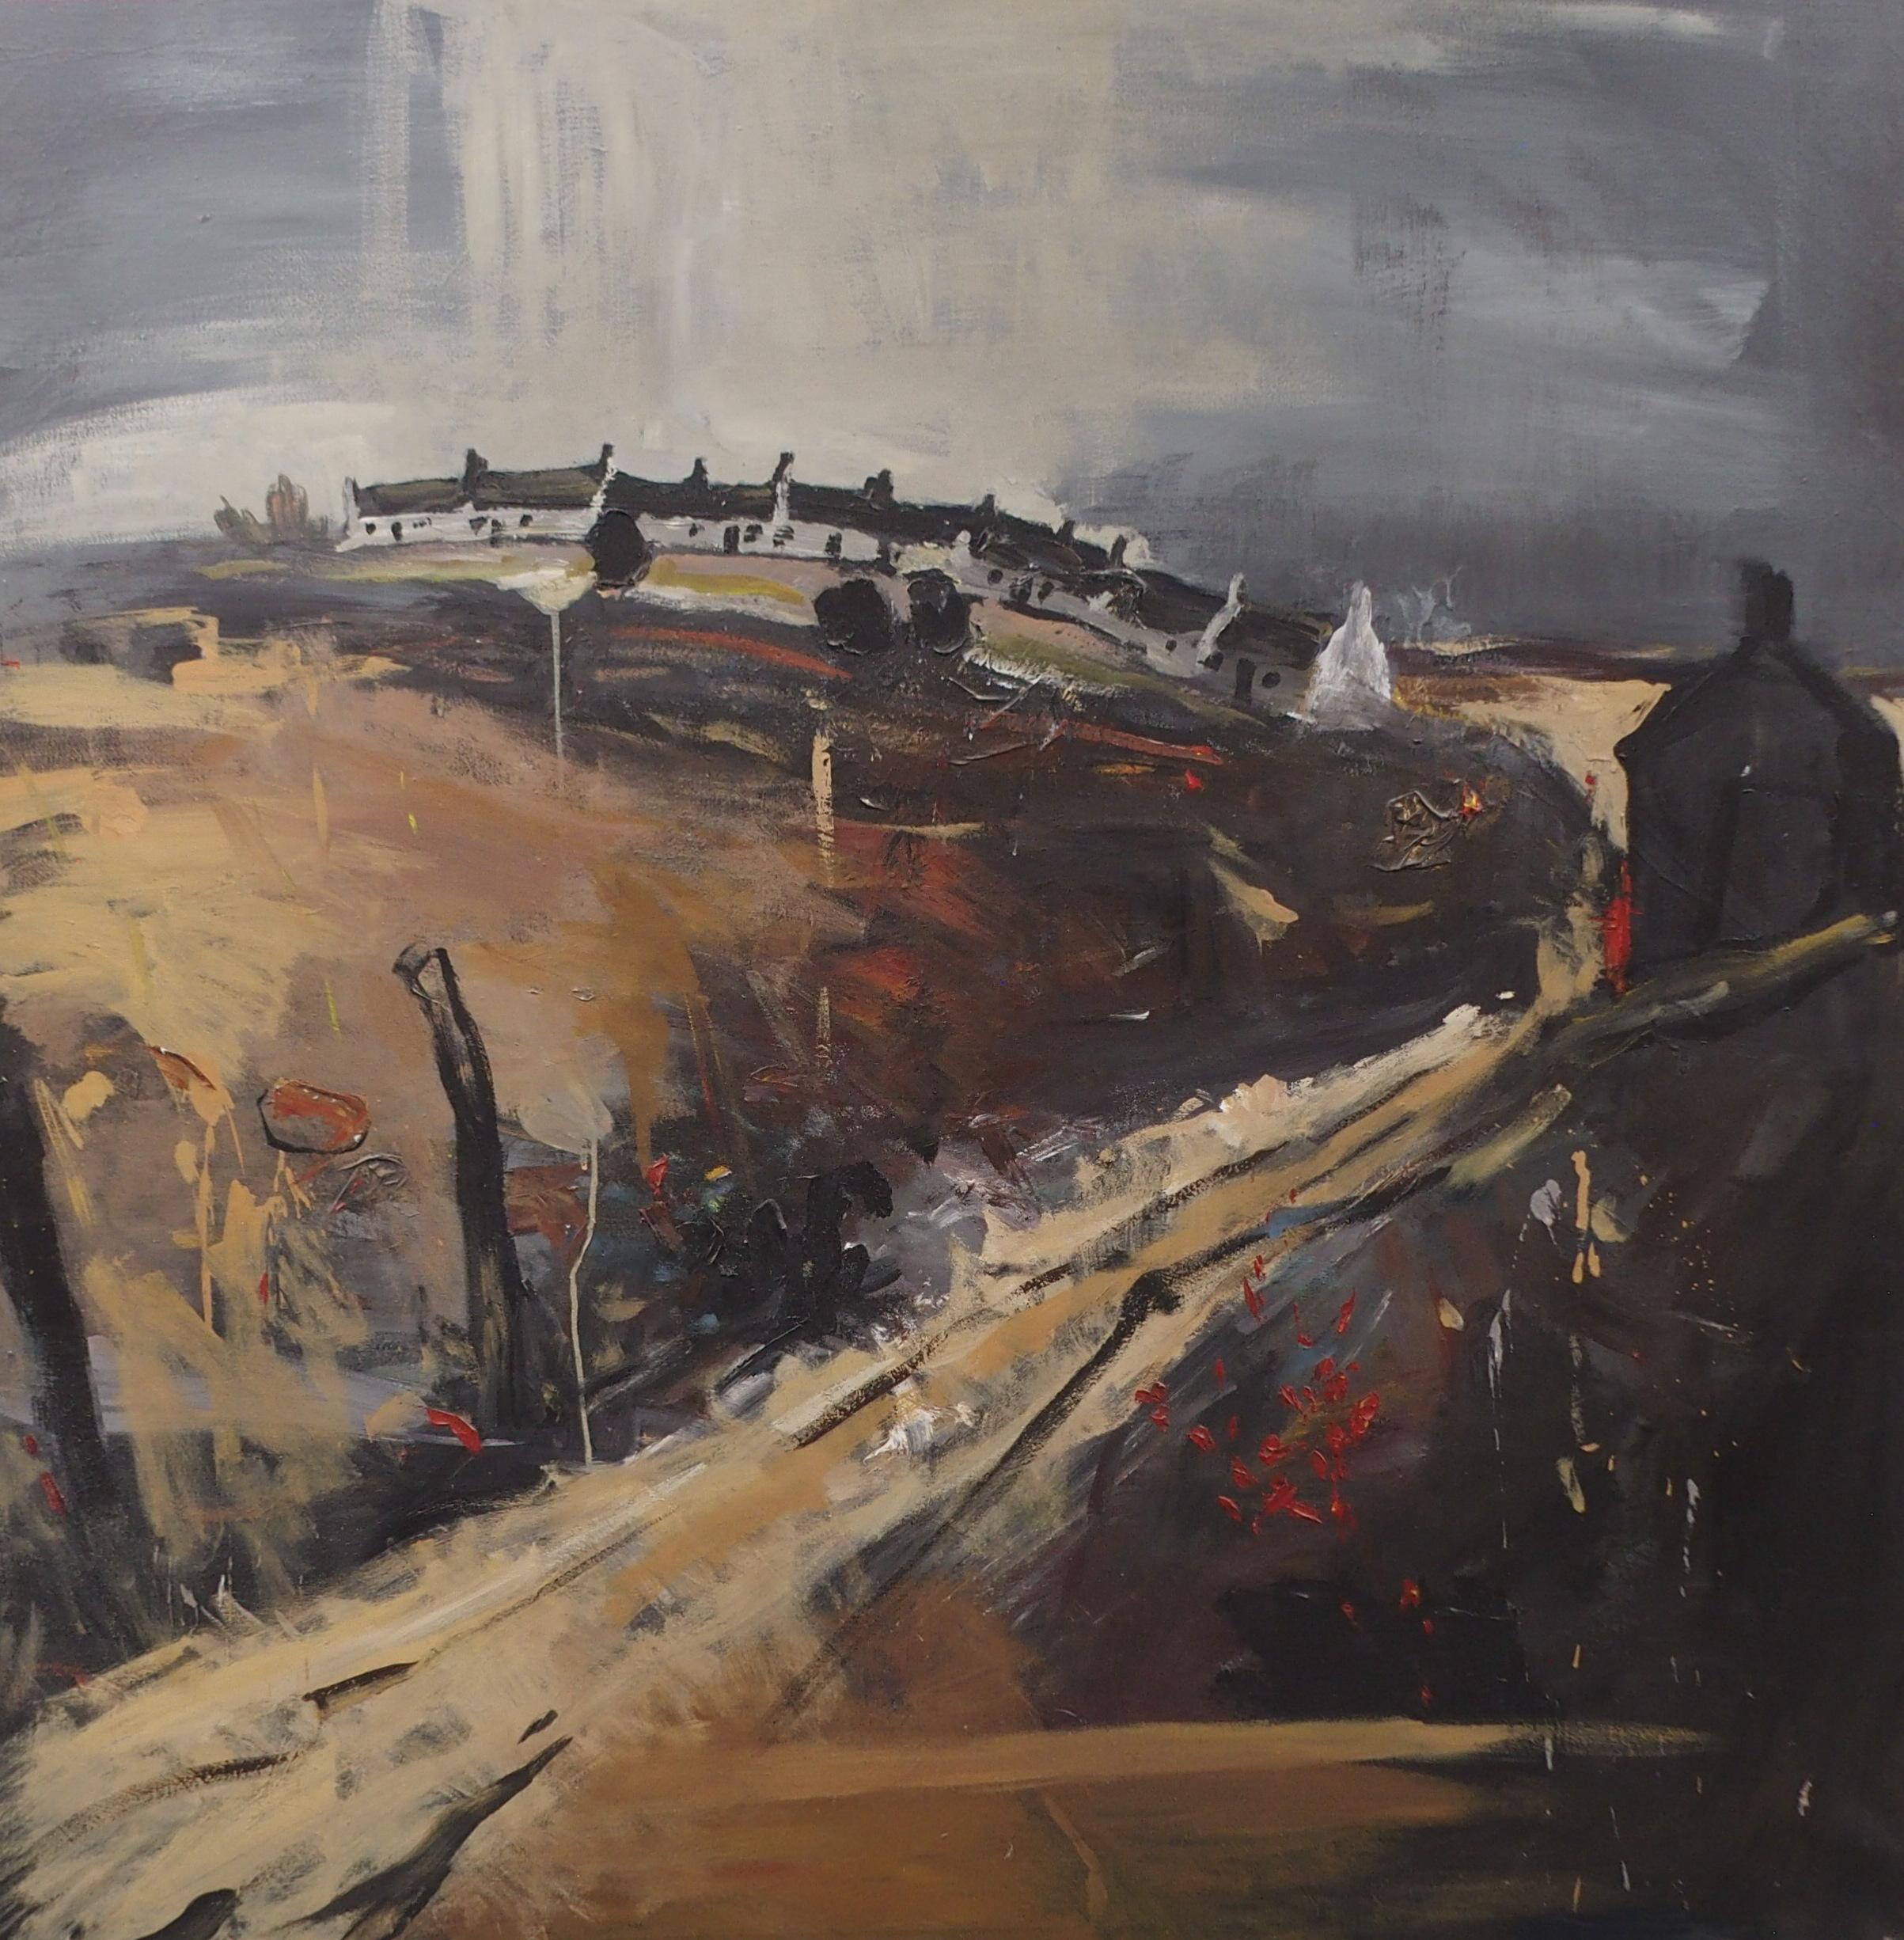 "SCOTTISH SCHOOL (20TH CENTURY) CATTERLINE IN AUTUMN Oil on canvas, 152 x 152cm (60 x 60"") - Image 3 of 3"